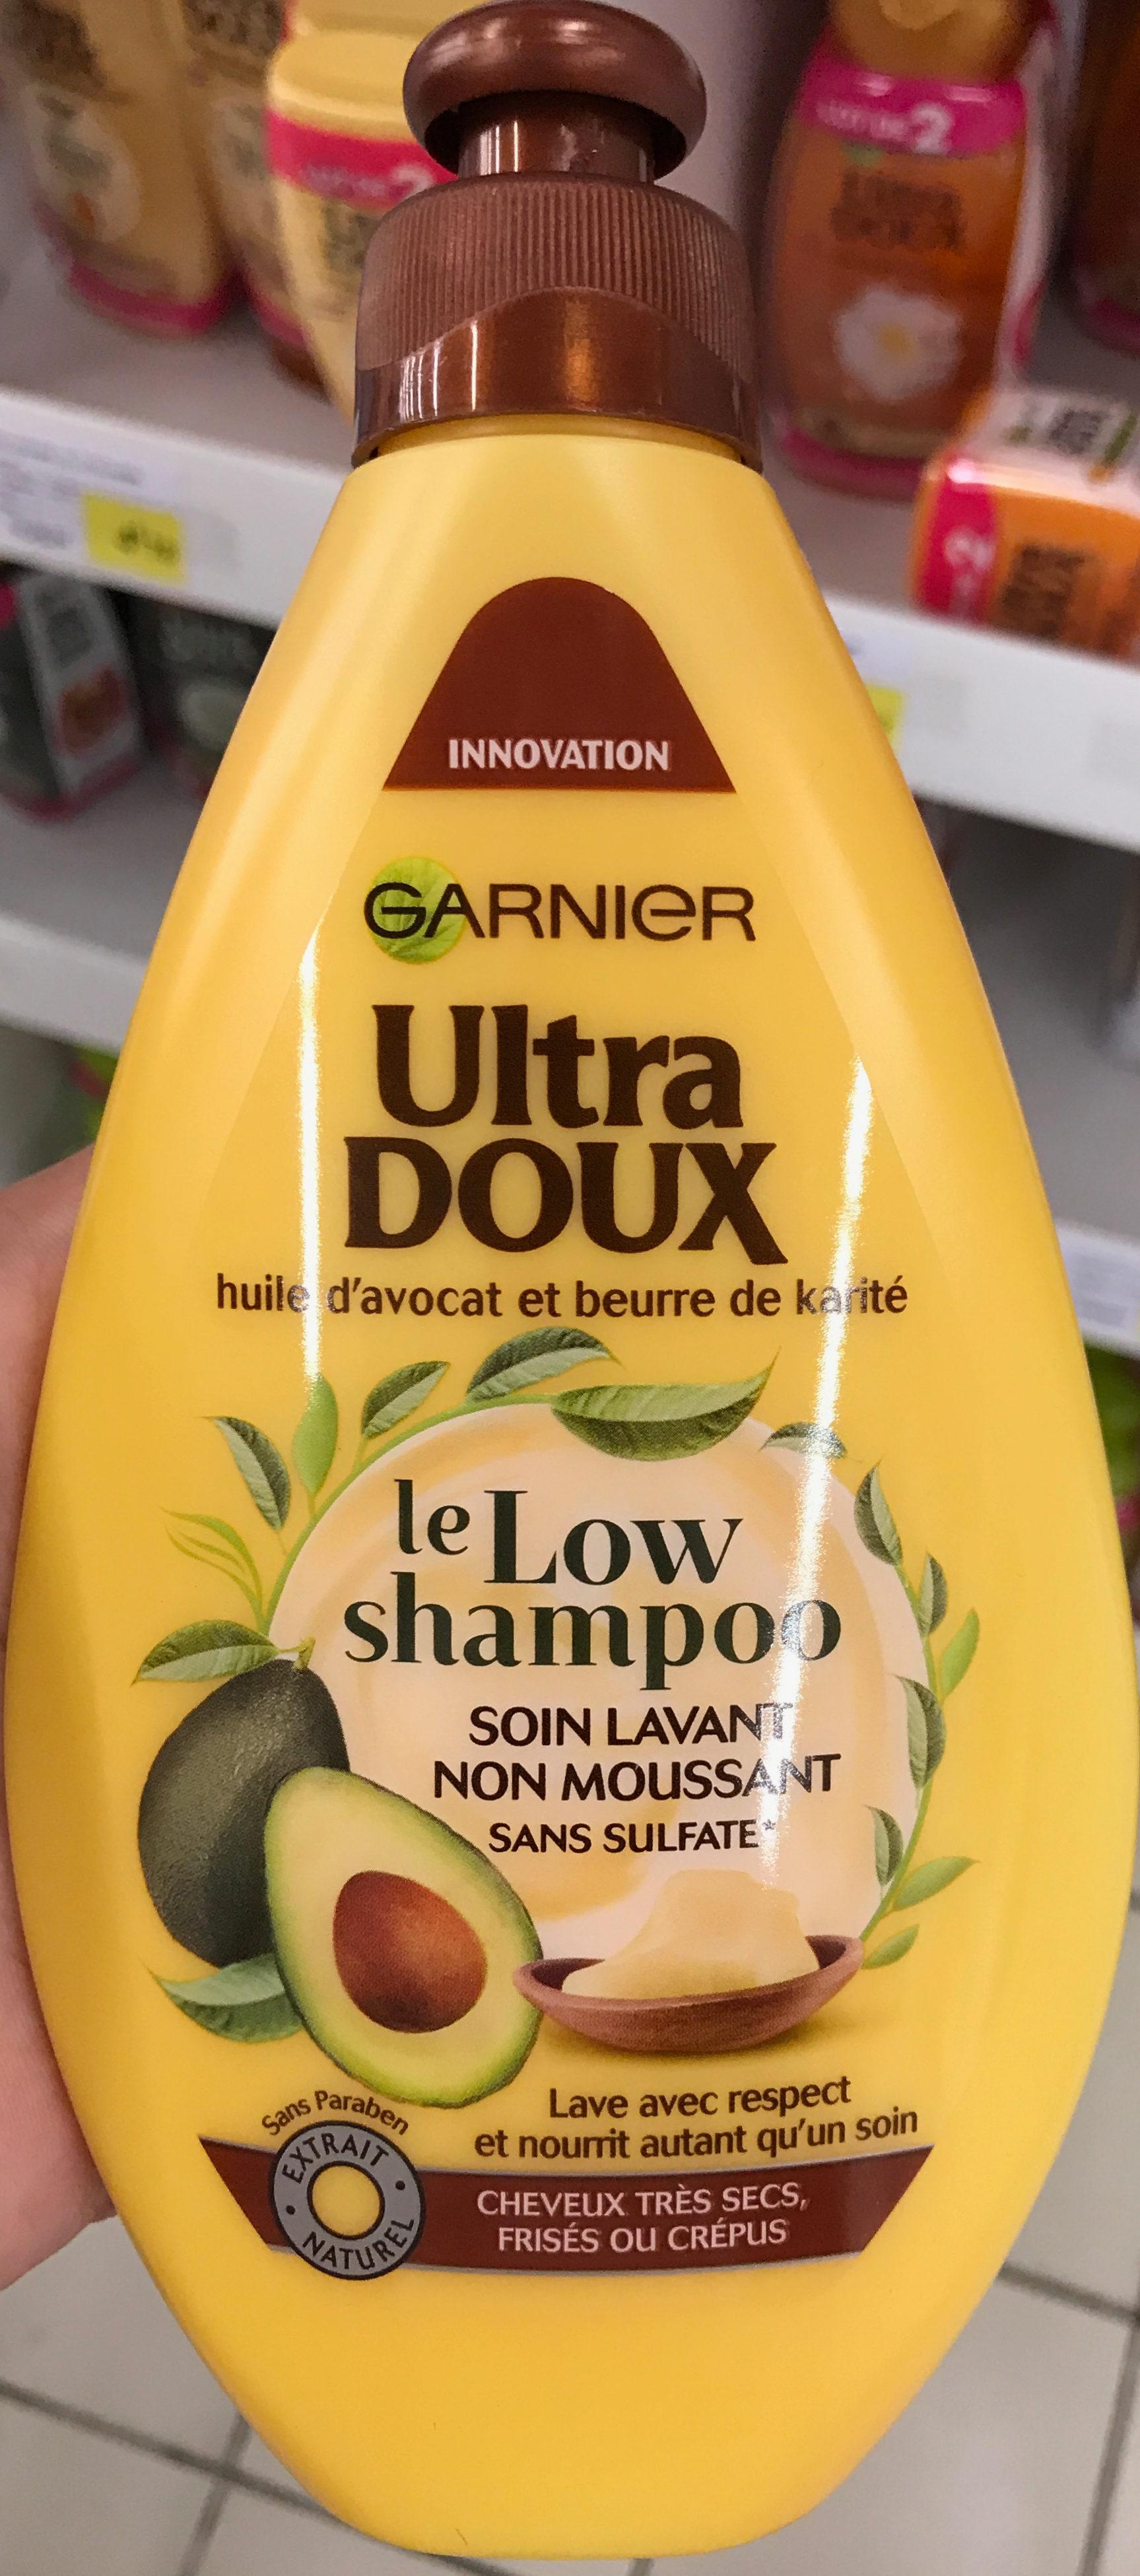 Ultra Doux Le Low Shampoo - Product - fr